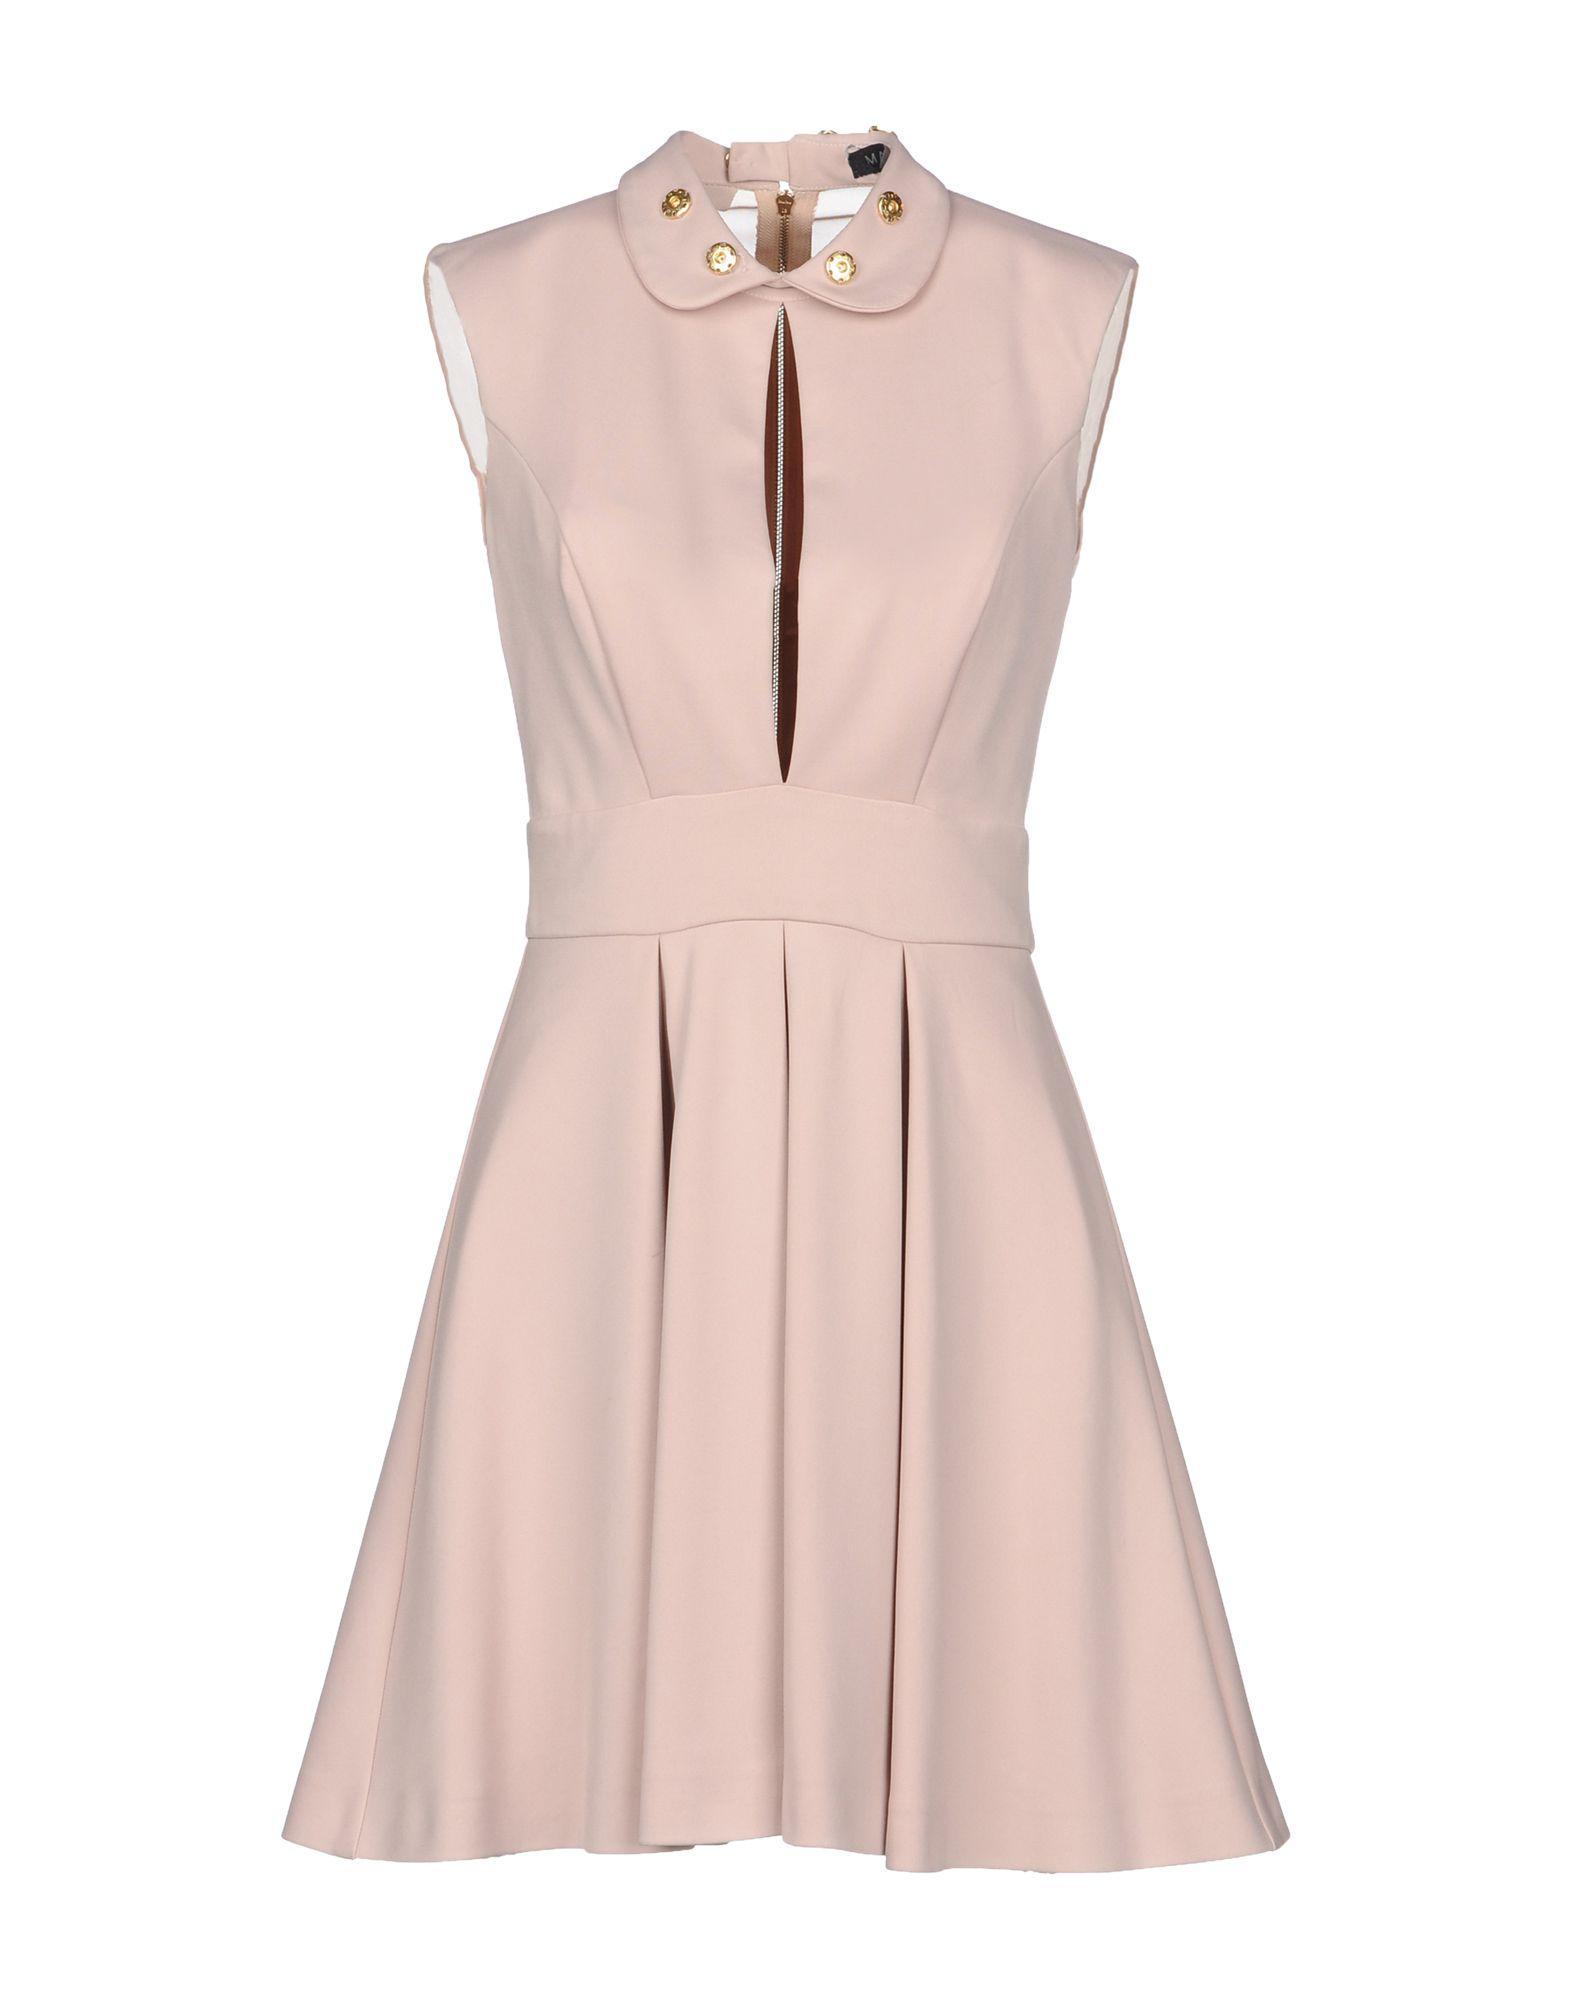 Mangano Short Dress In Beige